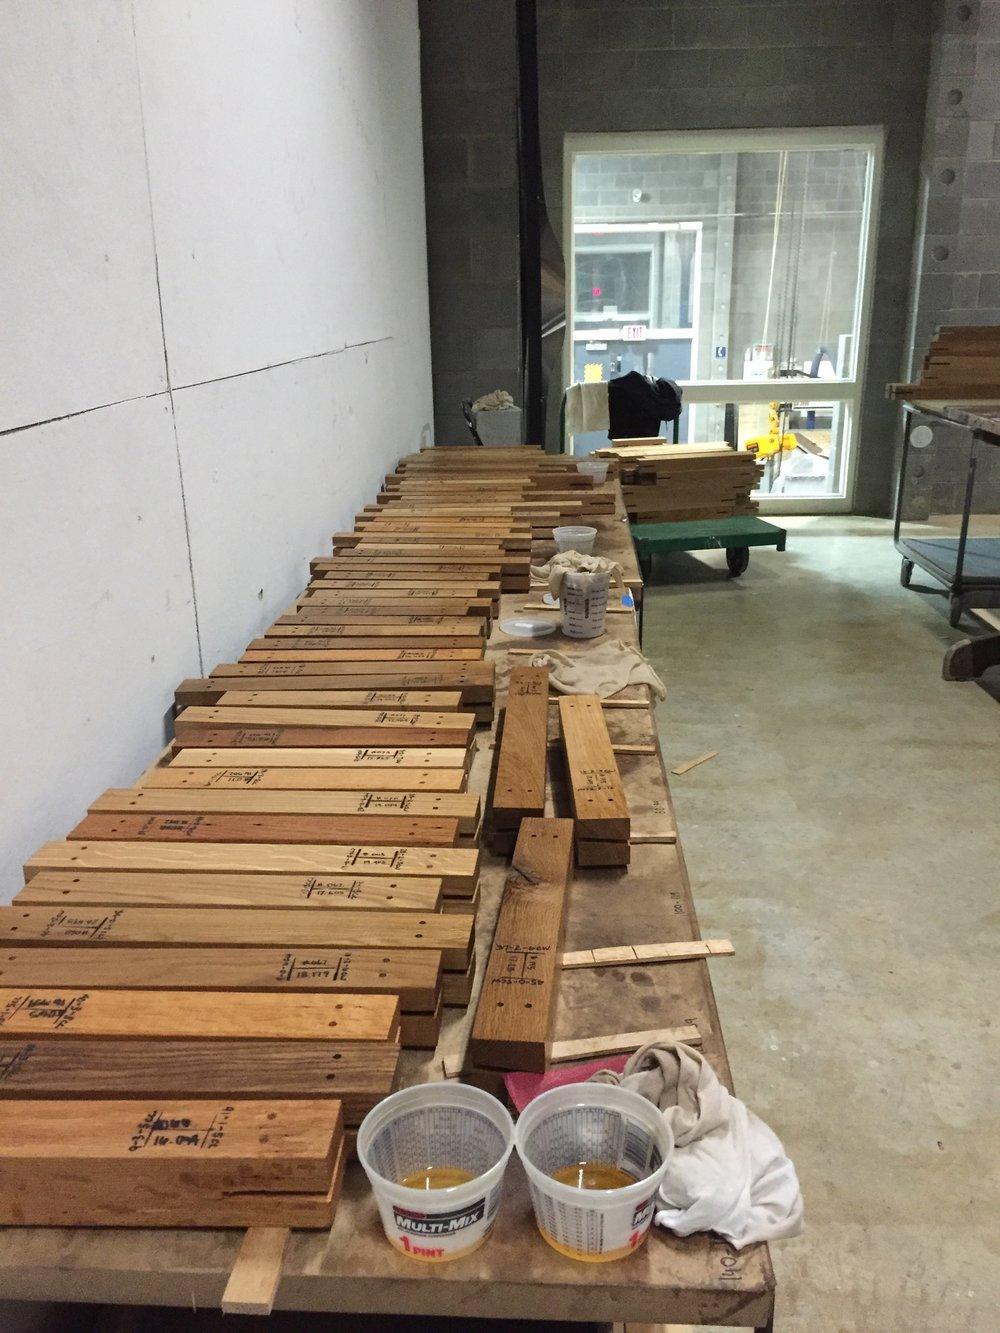 Wooden members